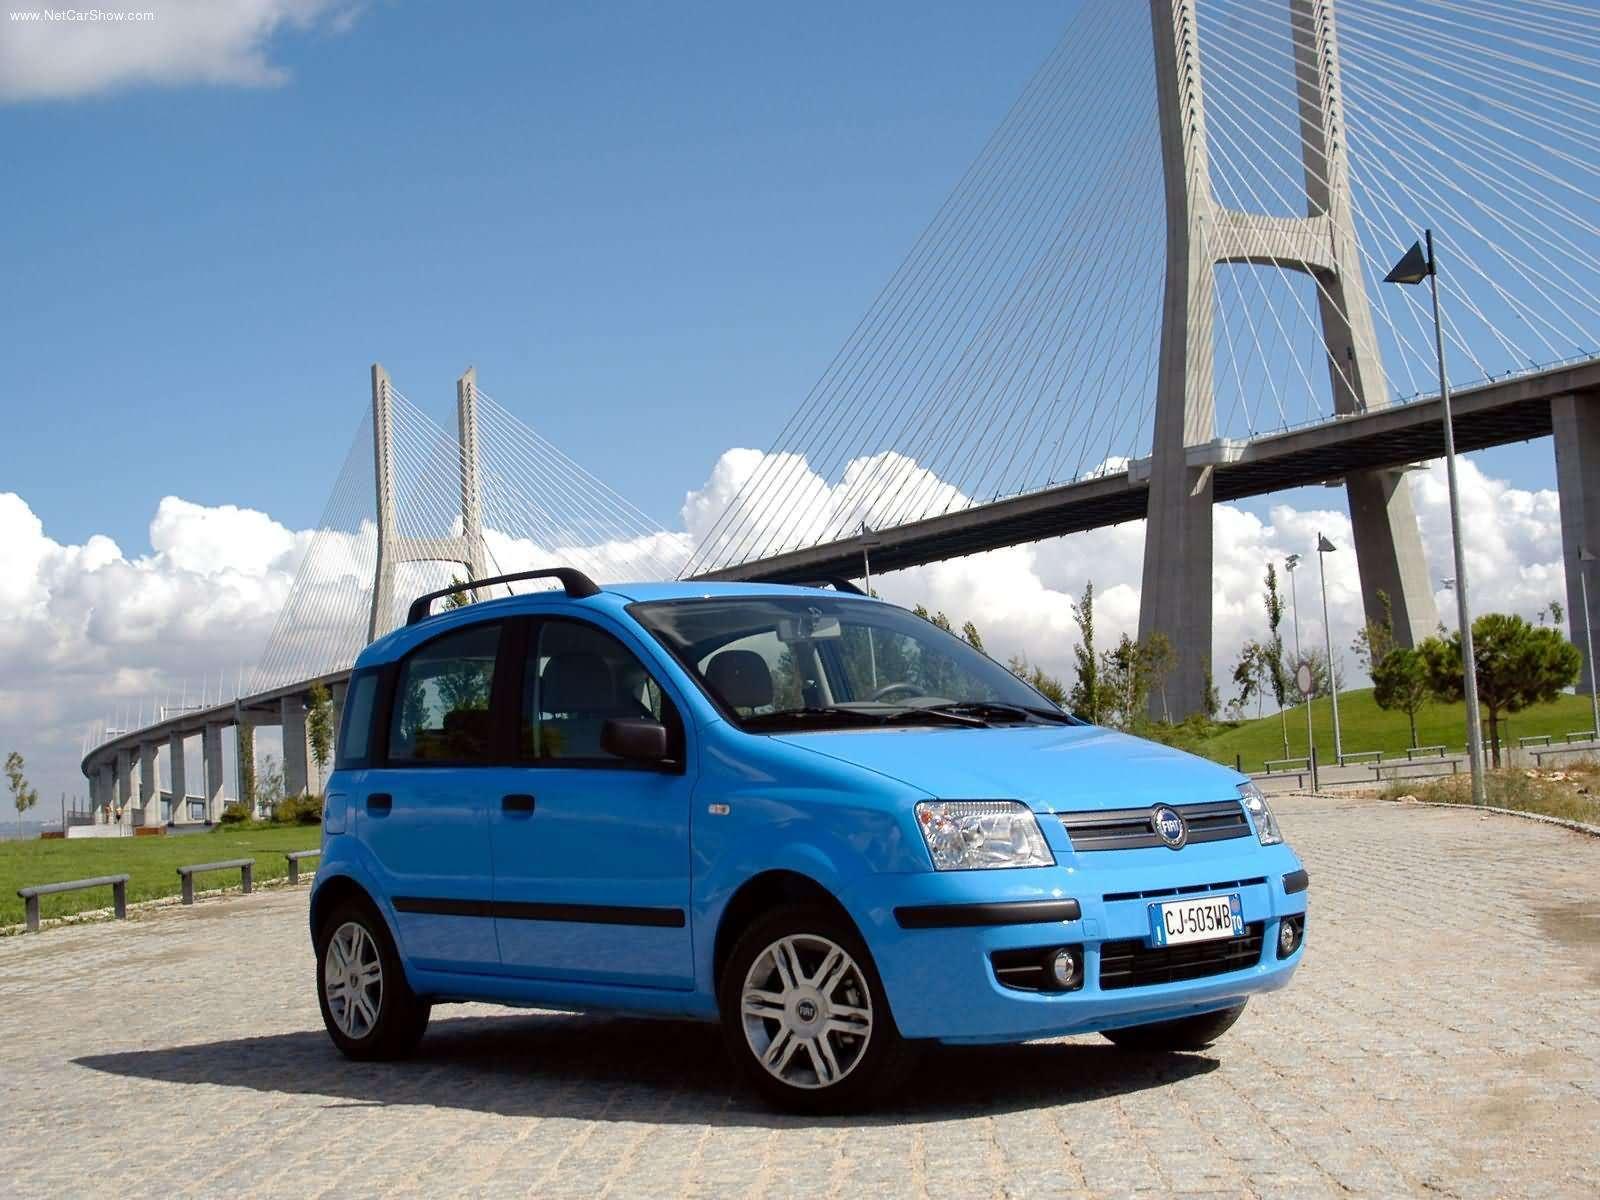 Fiat Panda Wallpaper 7   1600 X 1200 stmednet 1600x1200